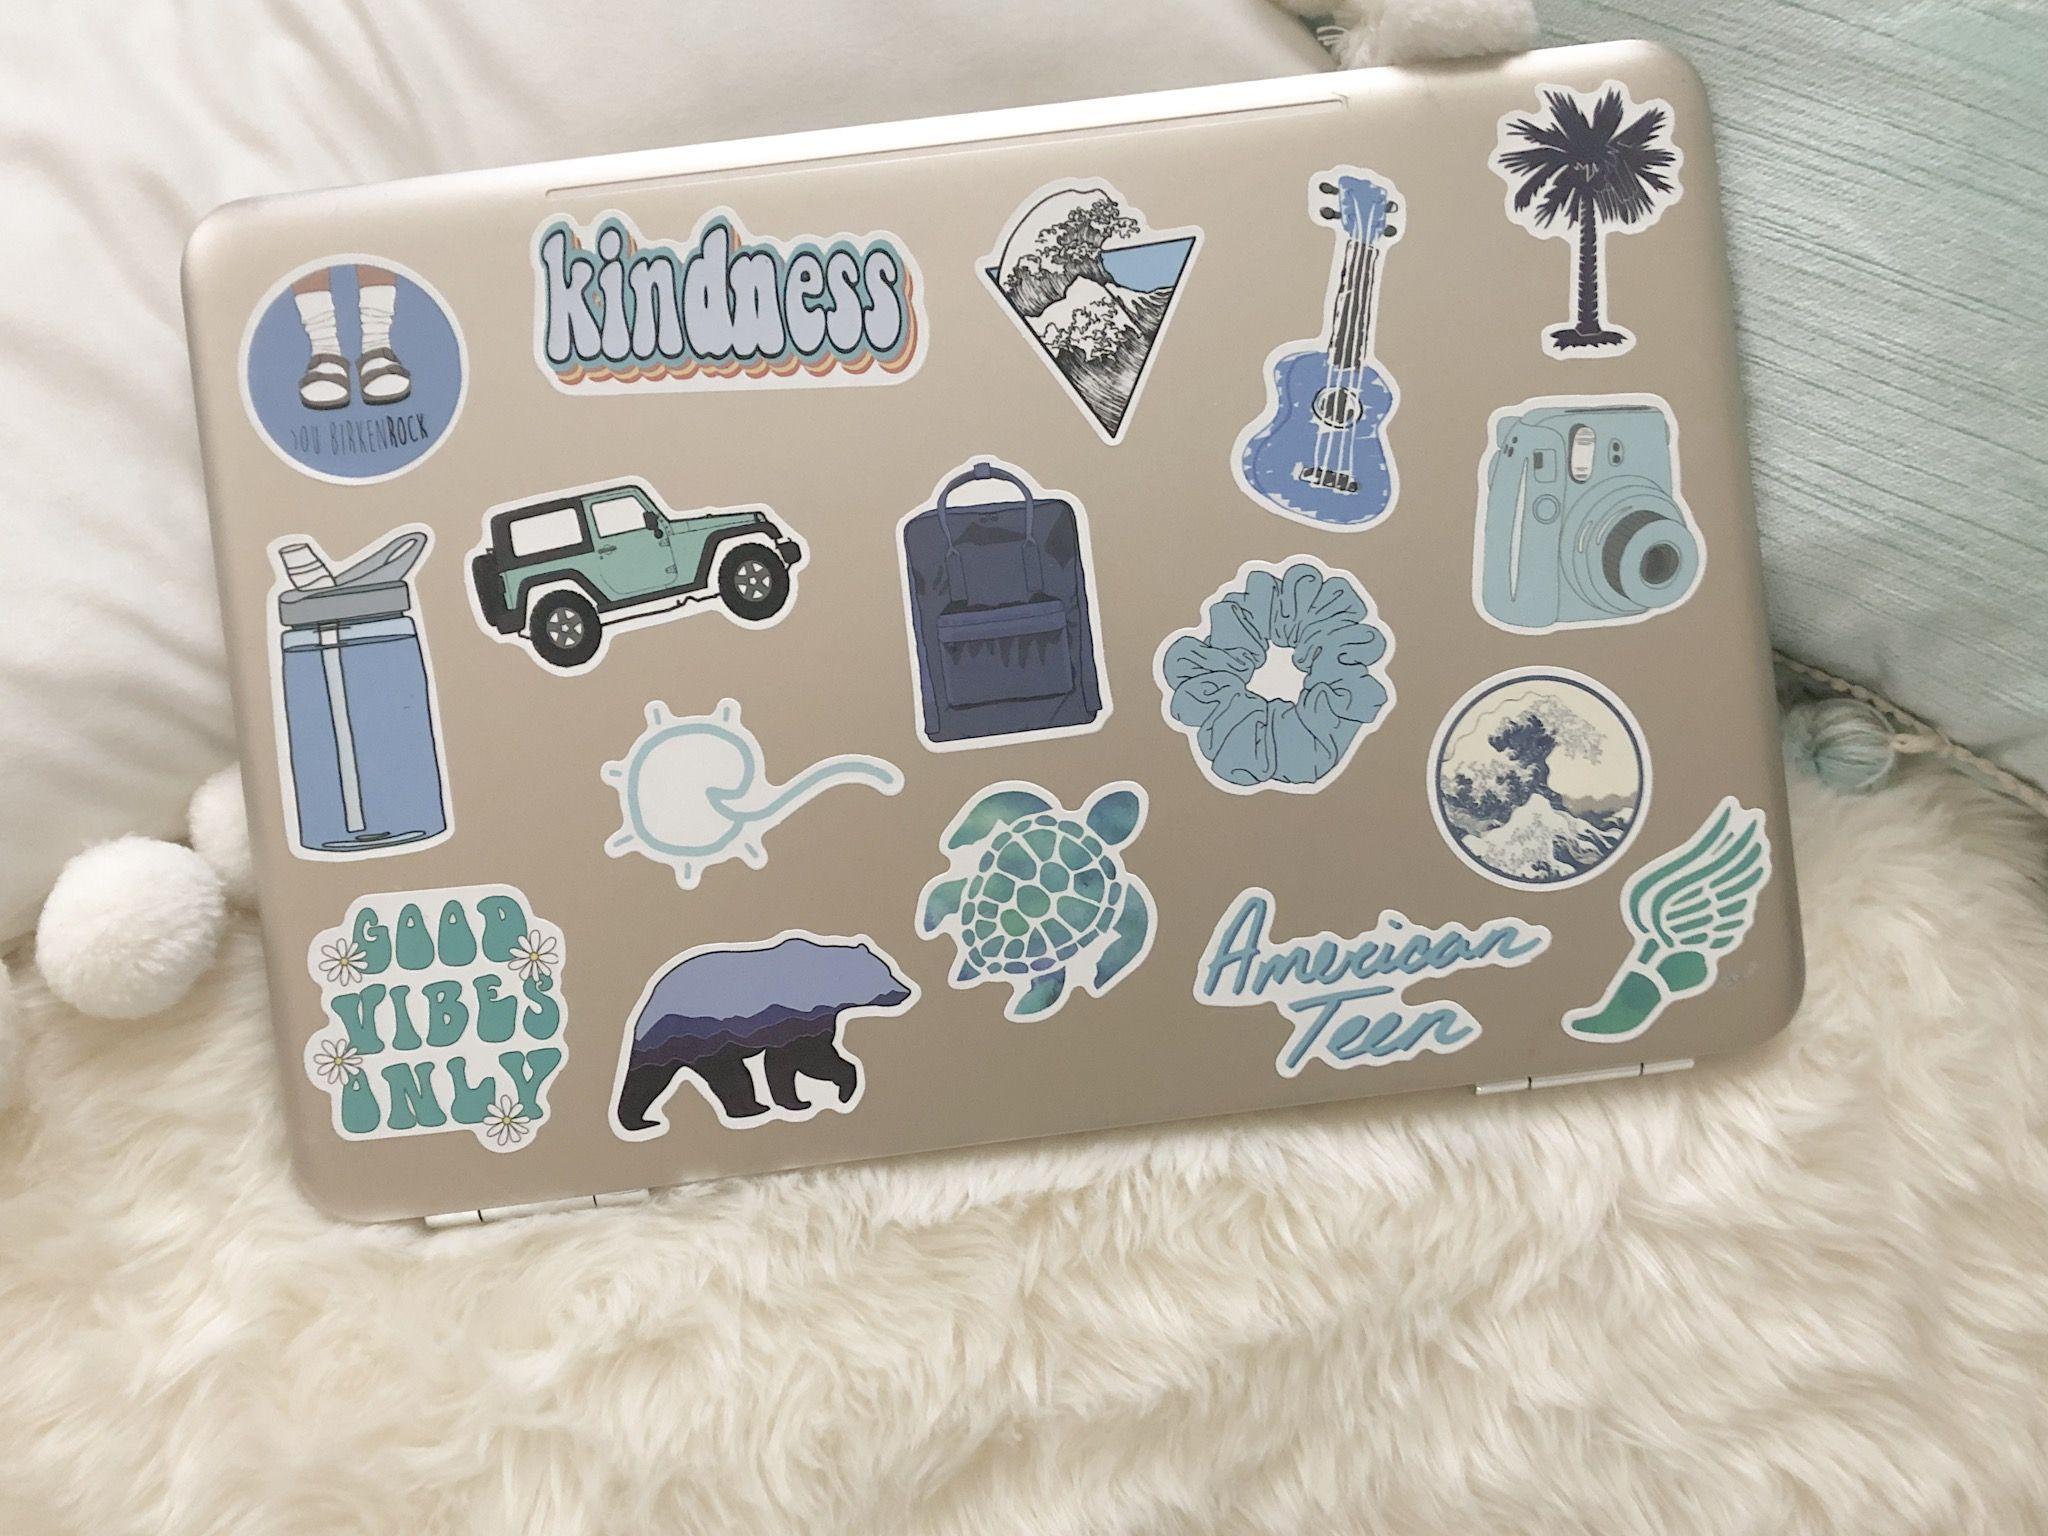 Am I Vsco Yet Laptop Stickers Diy Laptop Case Stickers Cute Laptop Stickers